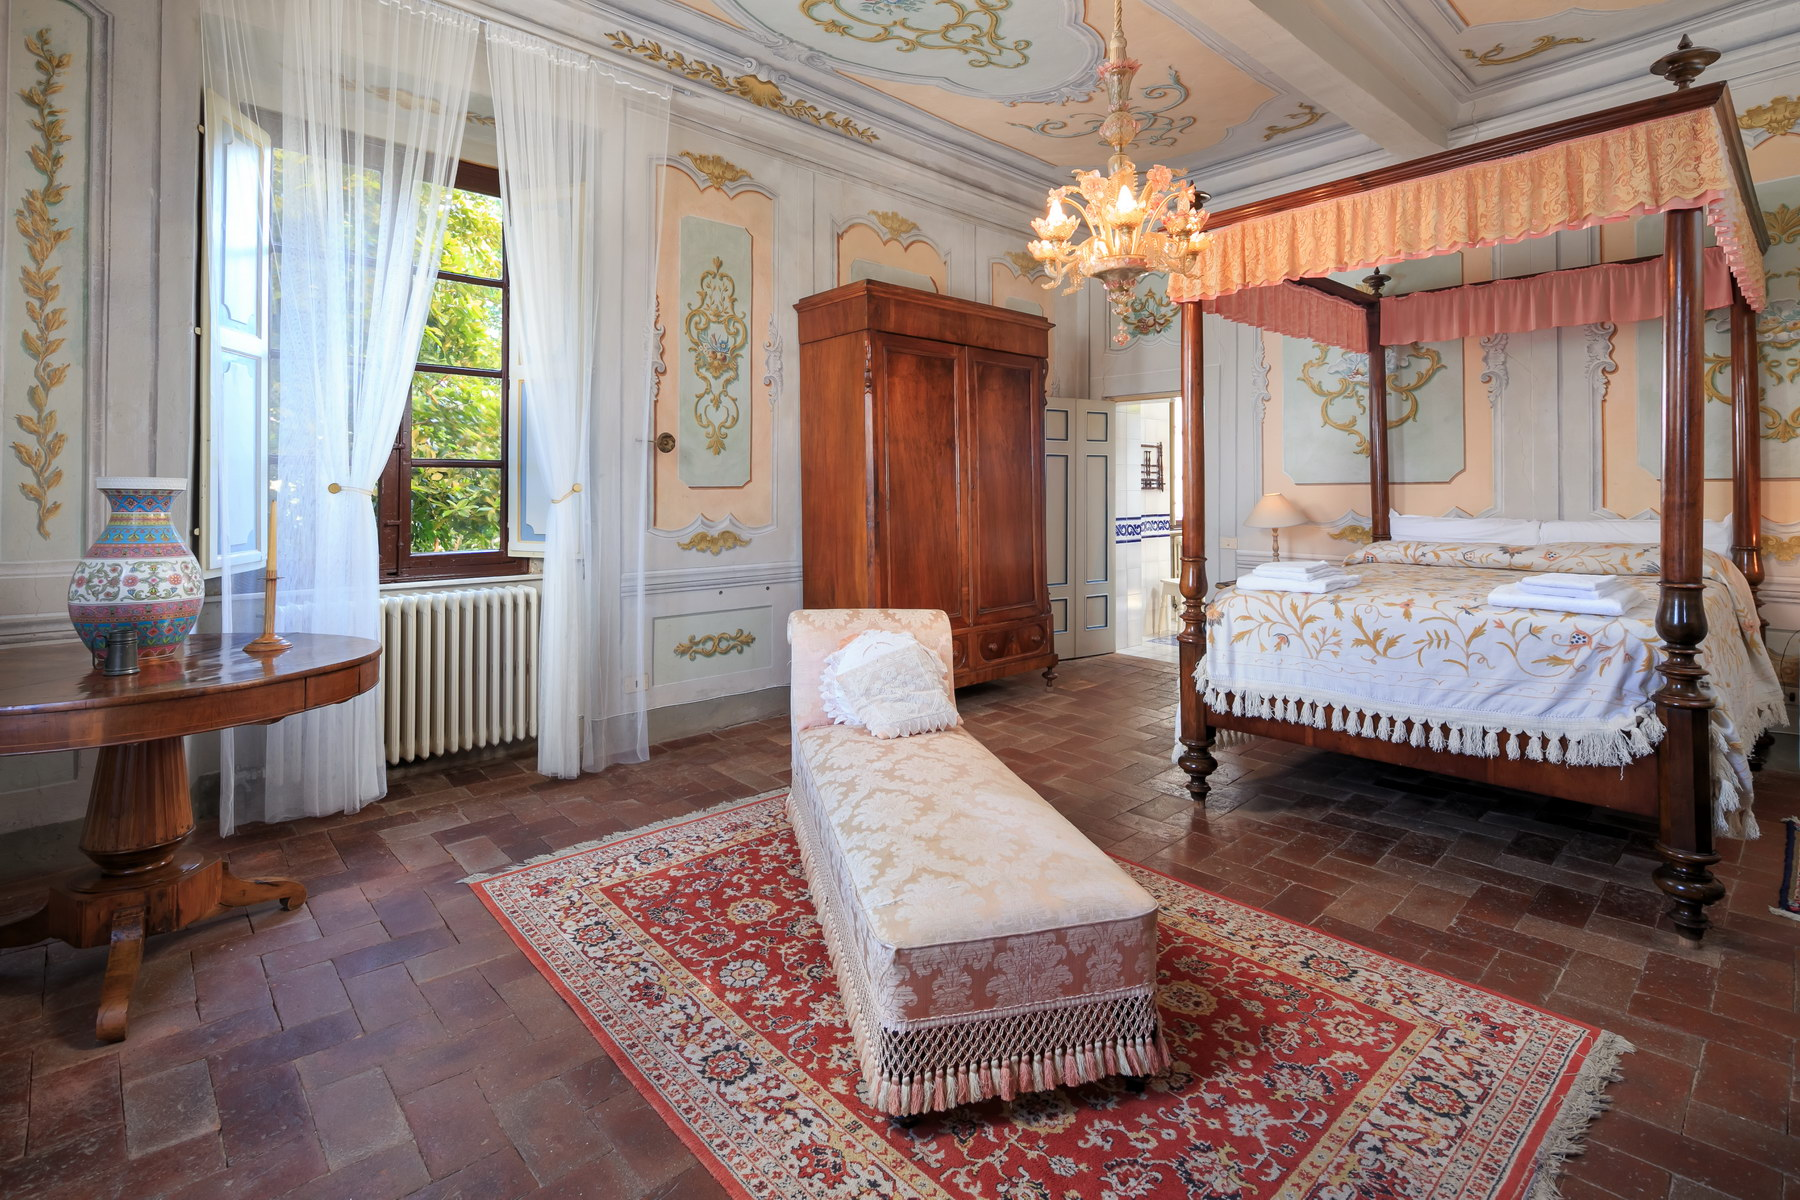 Villa in Vendita a Capannori: 5 locali, 570 mq - Foto 9